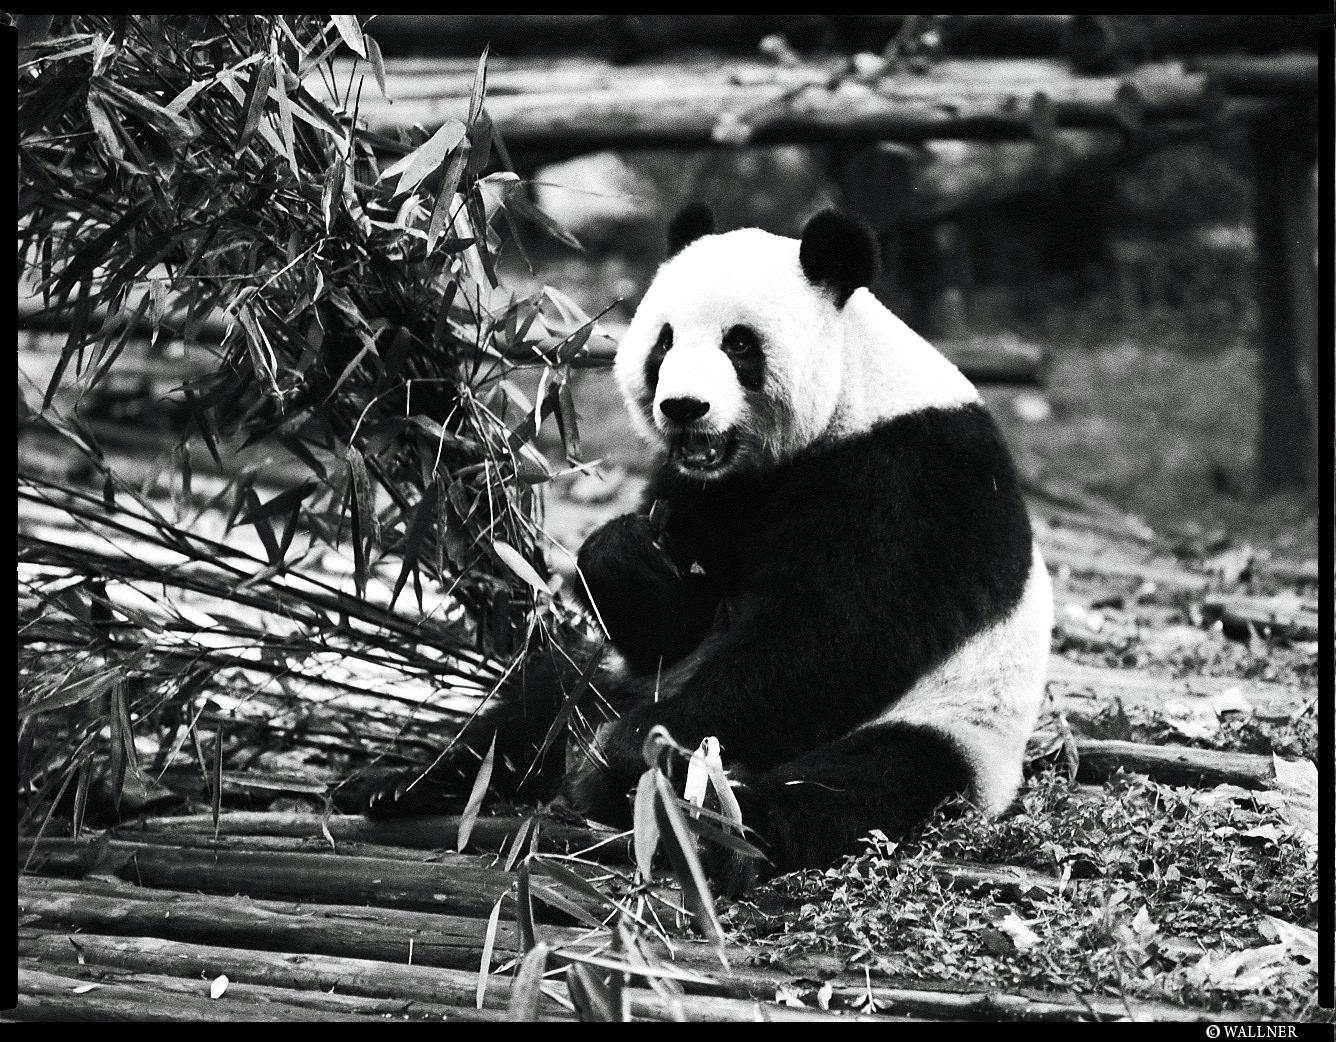 MediumFormatPatrikWallner_Chengdu_PandaEatingLOWQ